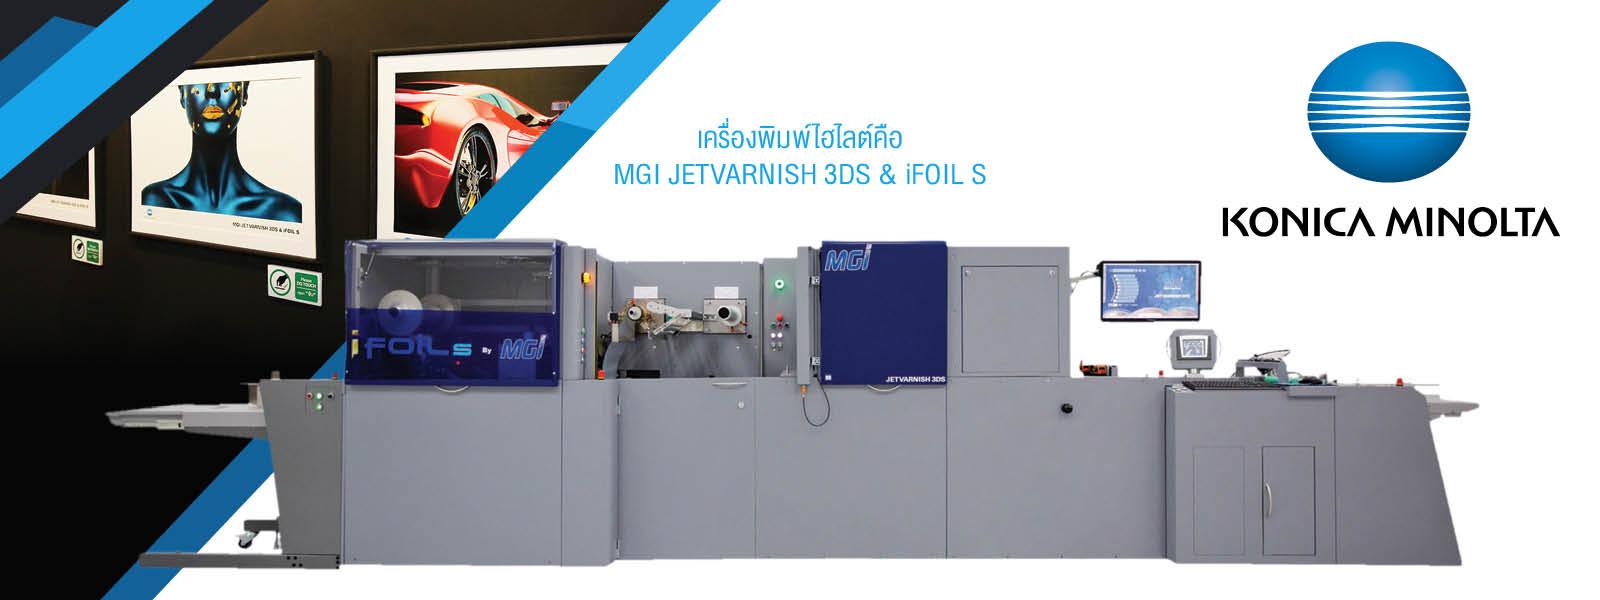 p62-65_2